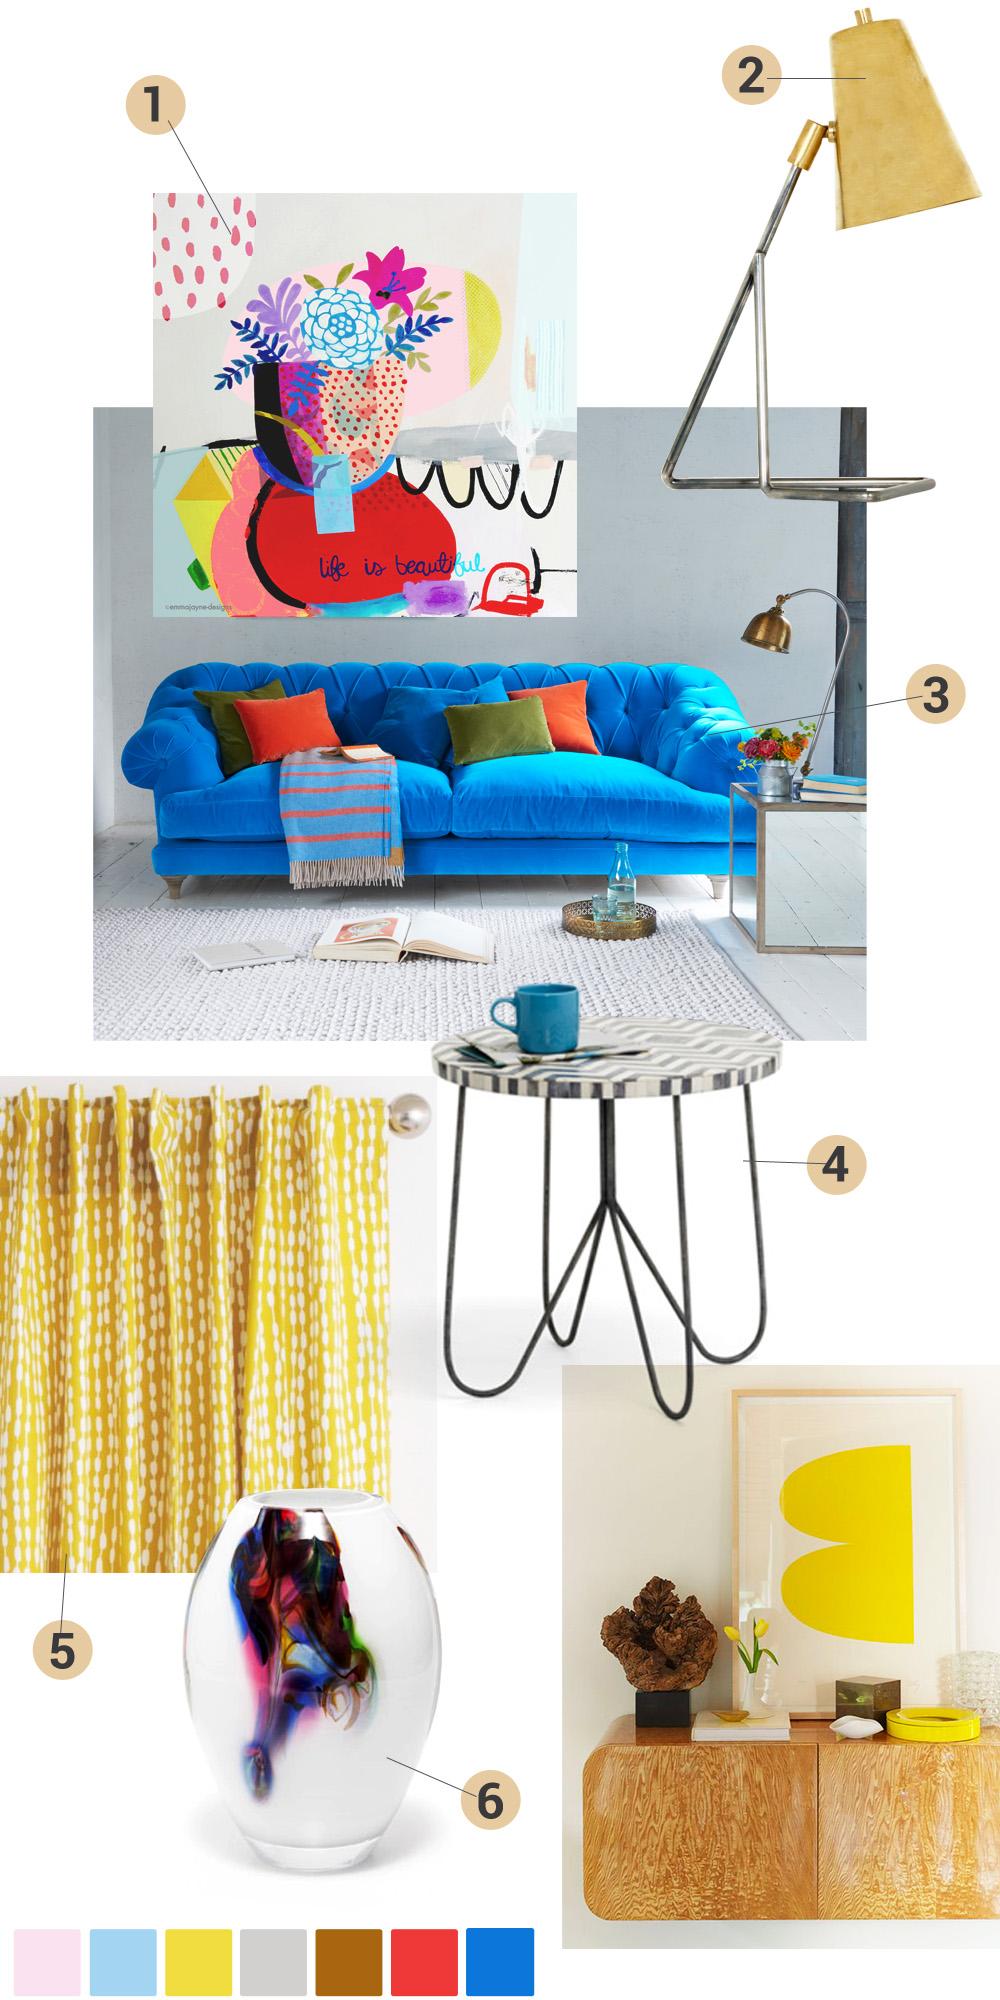 Abstract-livingroom-decor-emmajayne-designs